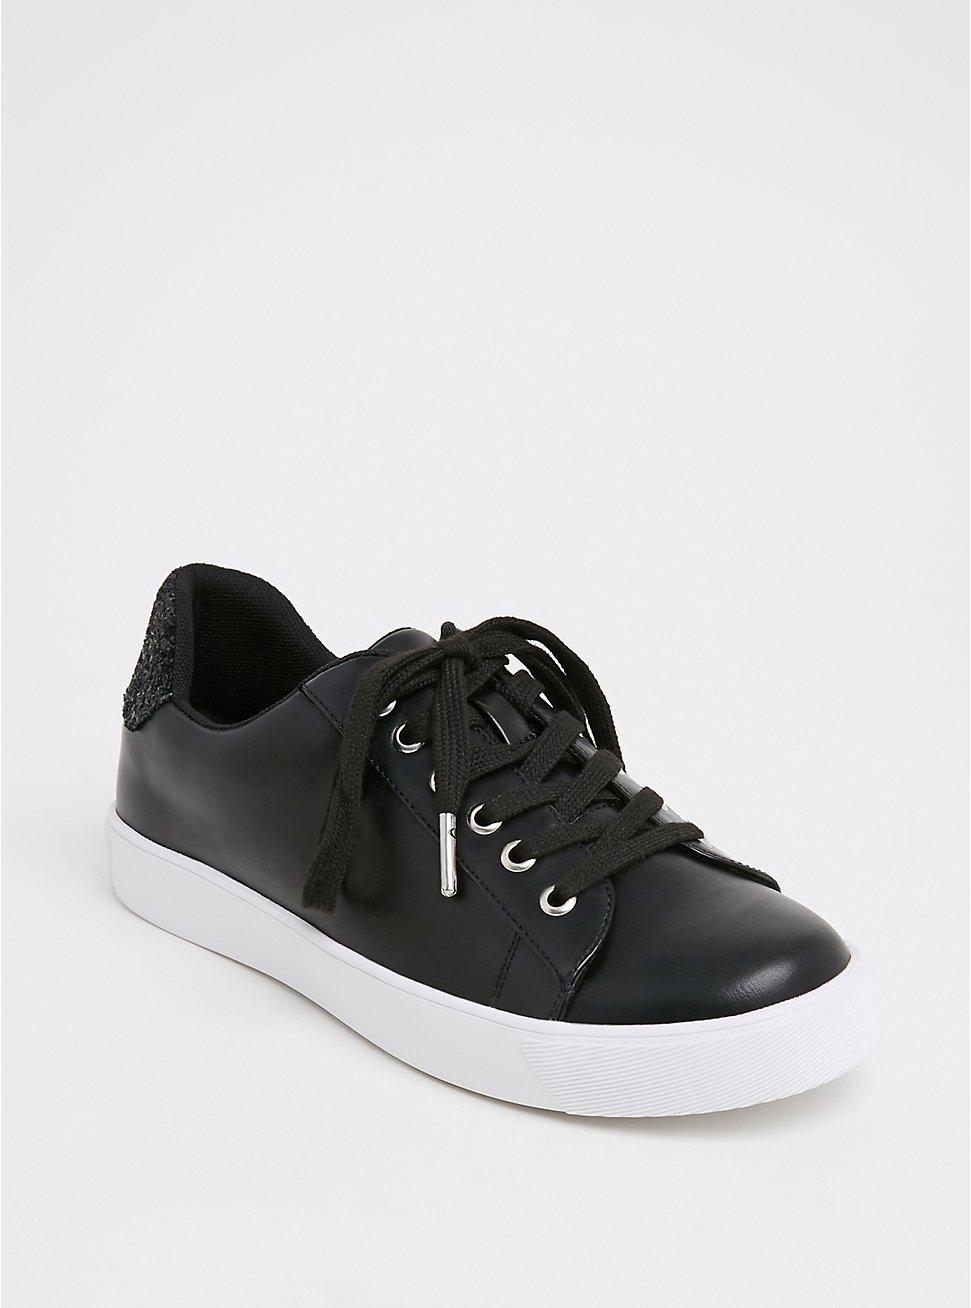 Black Faux Leather & Glitter Lace-Up Sneaker (WW), BLACK, hi-res